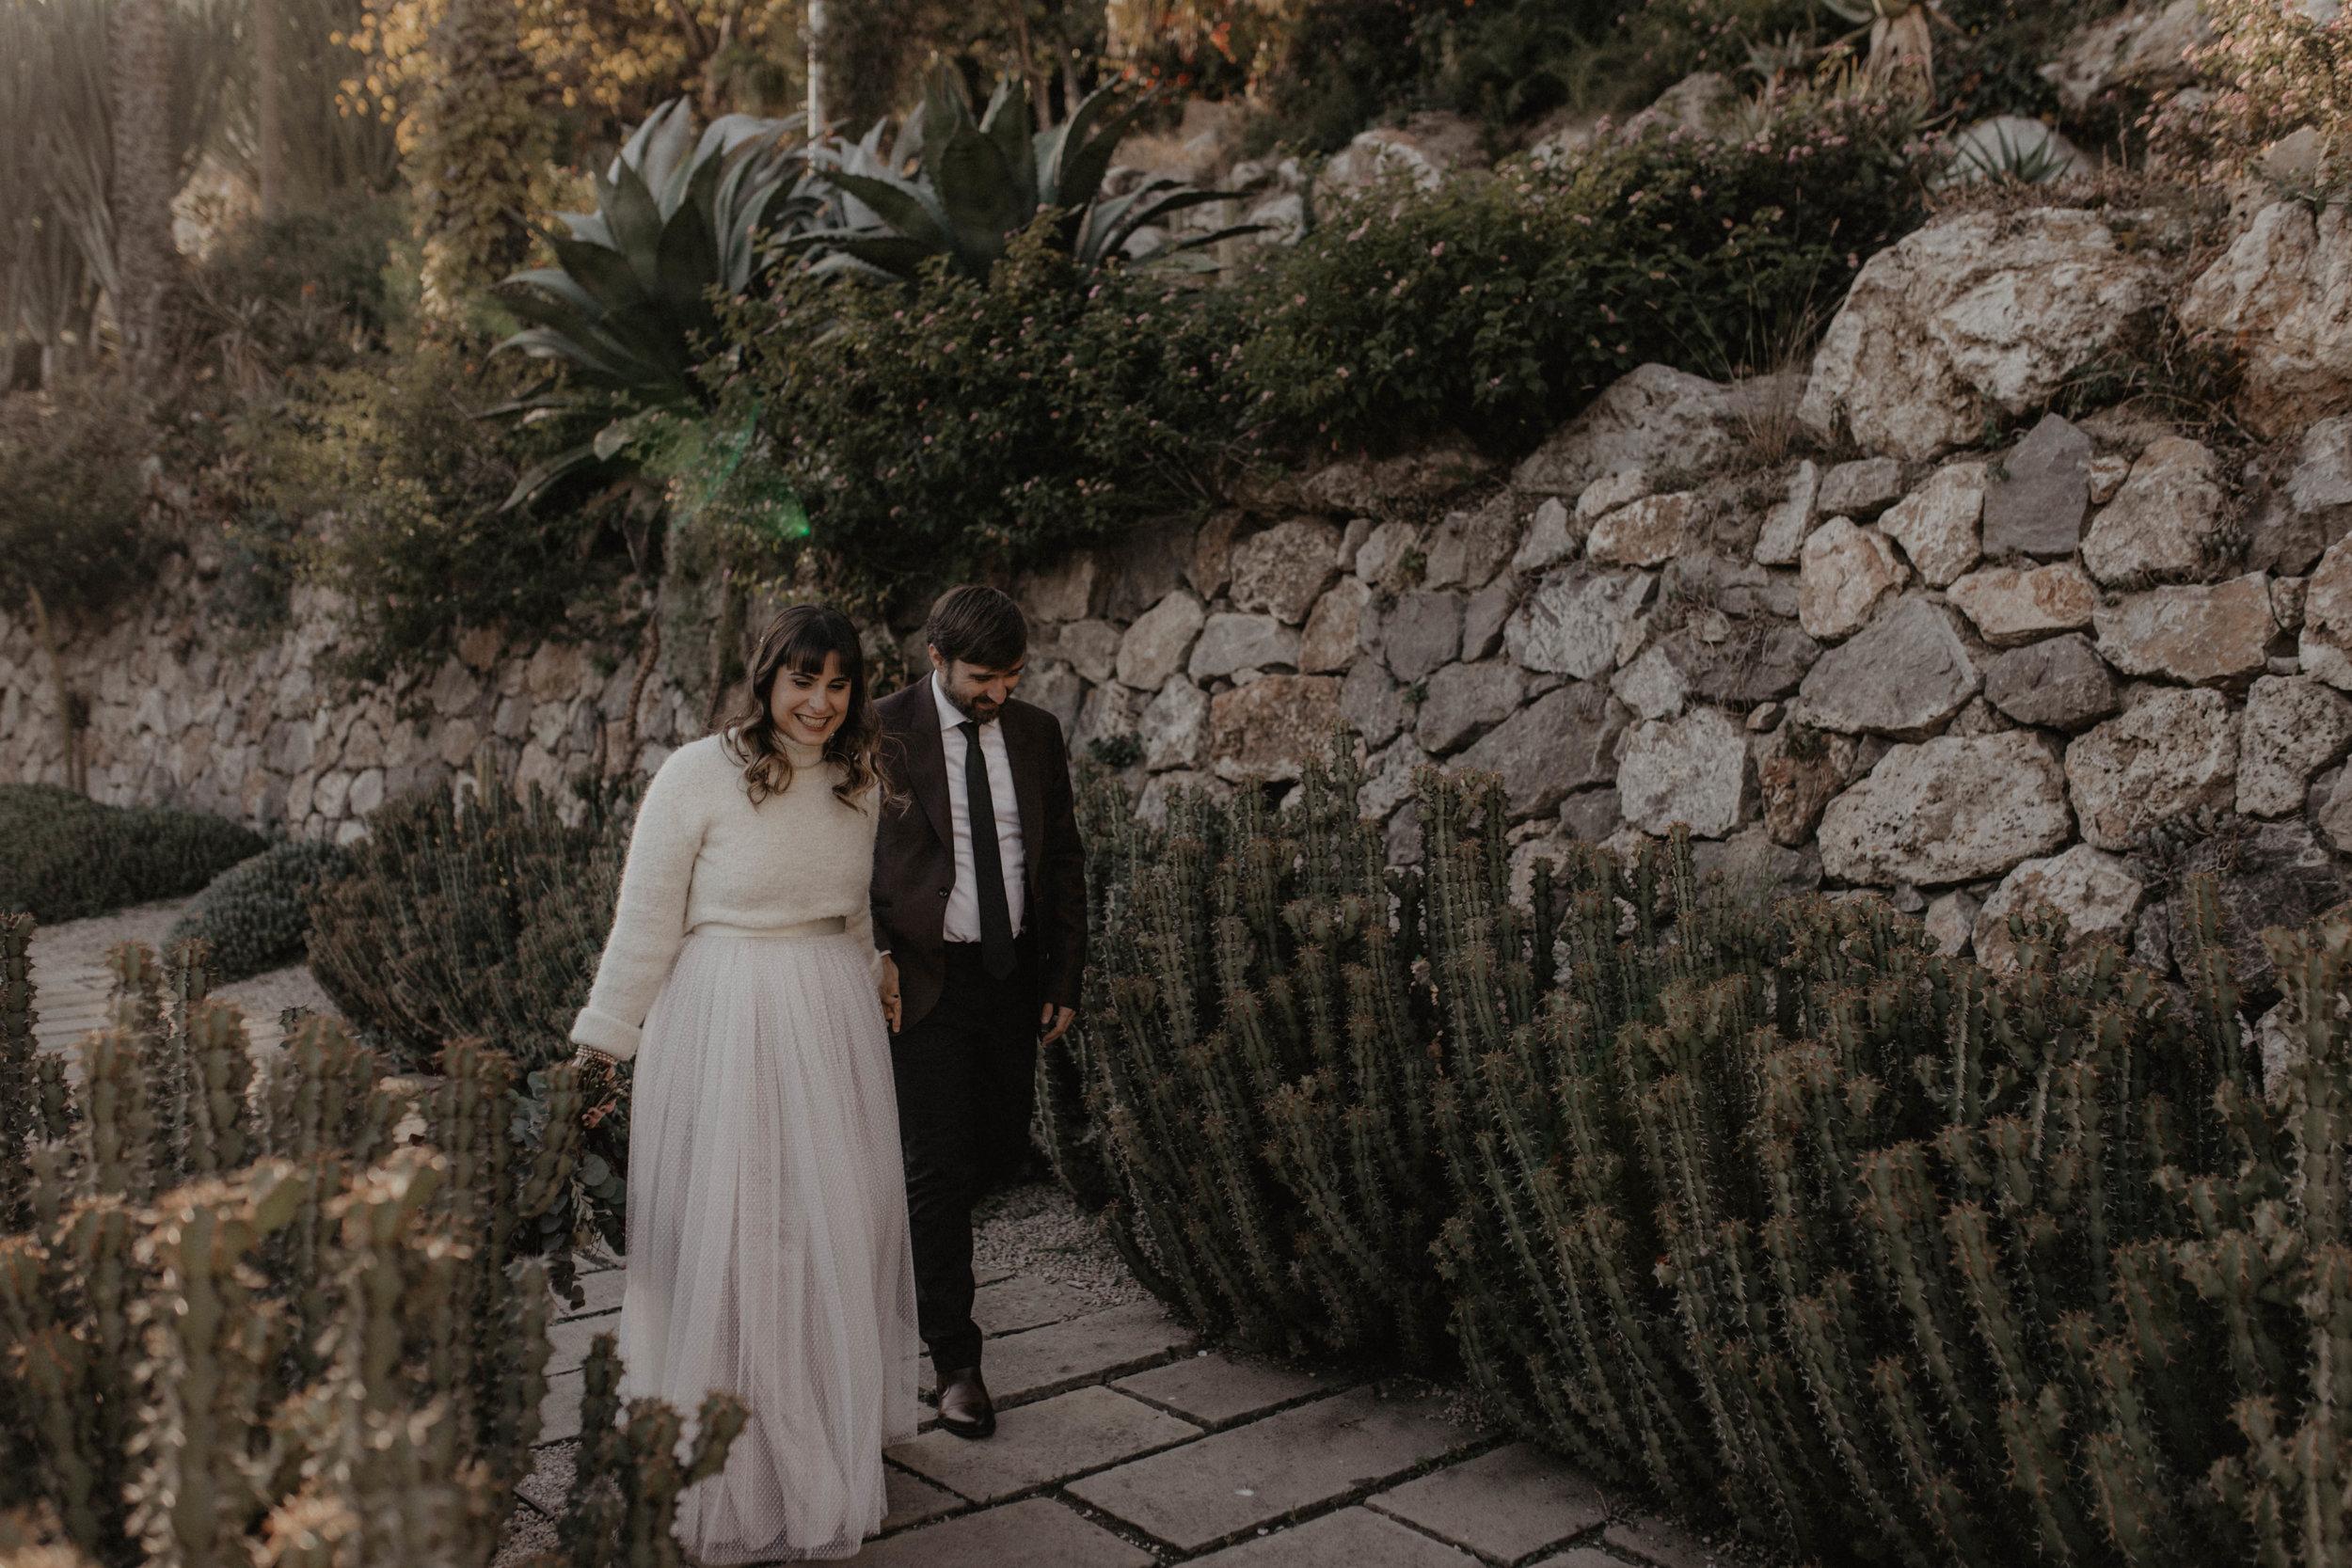 thenortherngirlphotography-photography-weddingphotography-couple-bodasconestilo-bodasenbarcelona-martadavid-344.jpg